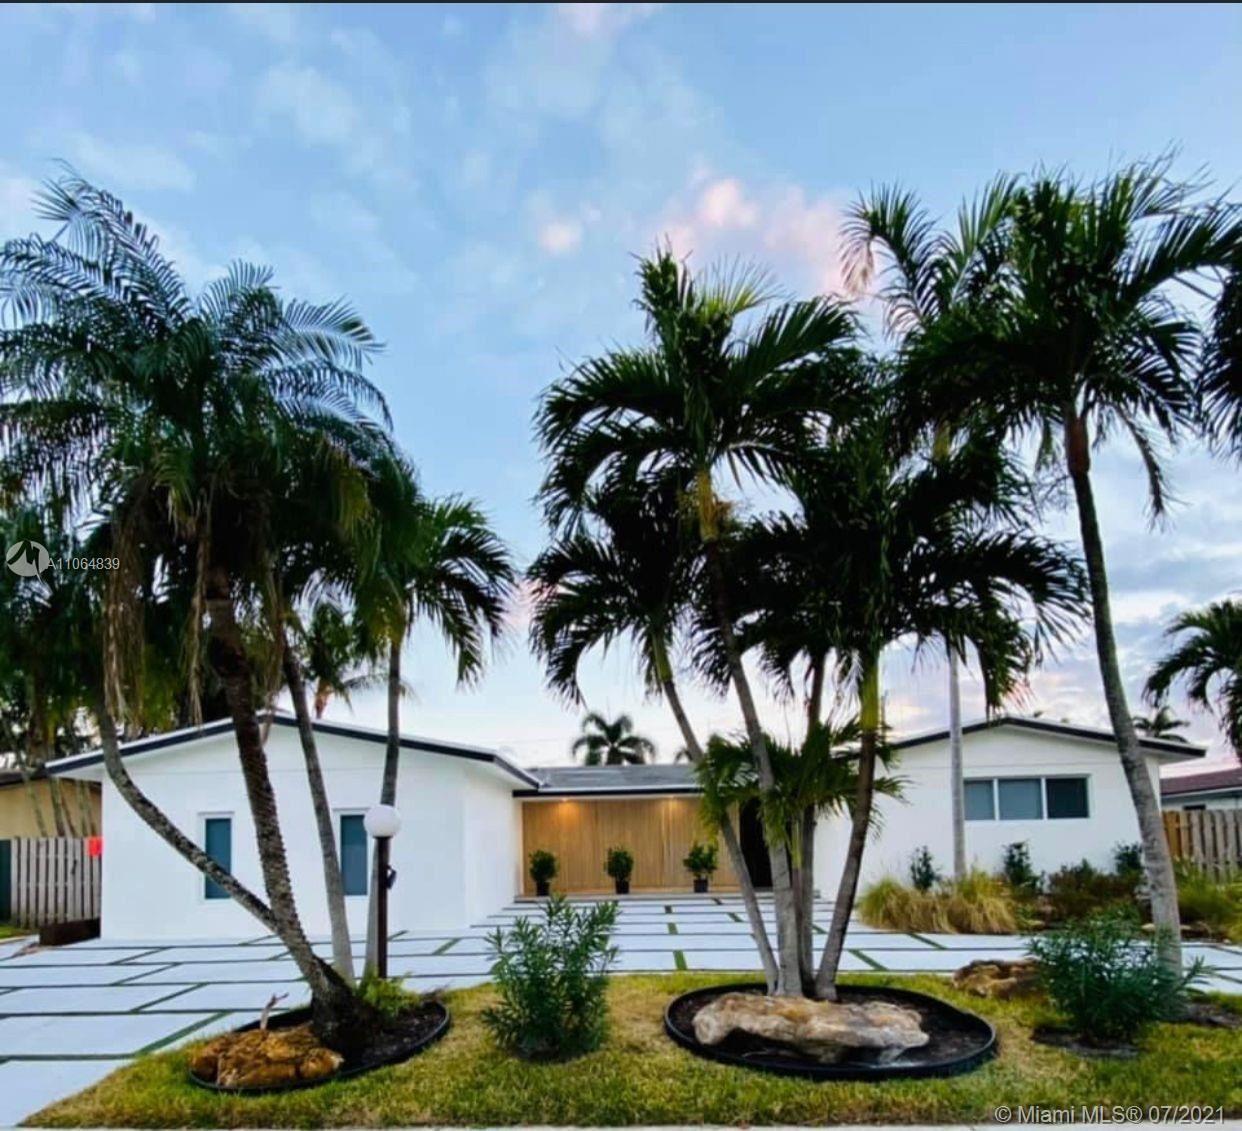 2050 NE 203rd St, Miami, FL 33179 - #: A11064839